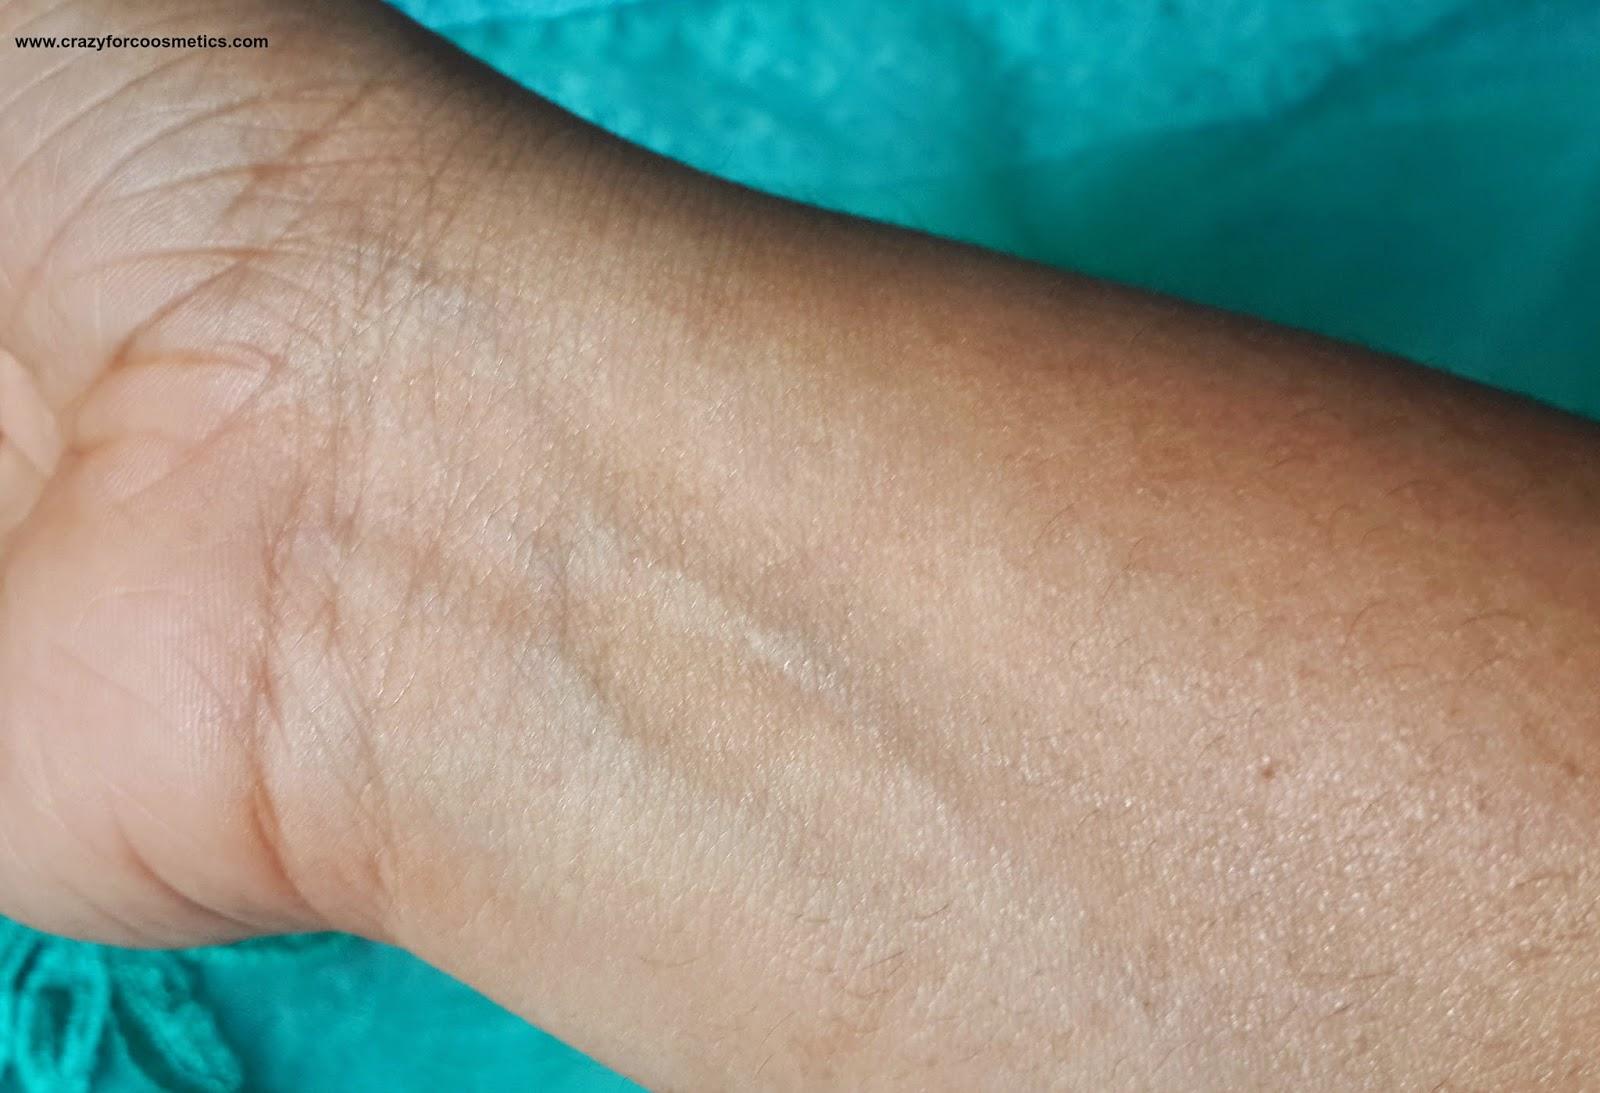 Bioderma Hydrabio Moisturiser Light Cream review-Bioderma Hydrabio Moisturiser Light Cream Price- Bioderma Hydrabio Moisturiser Light Cream effects -Moisturiser for face